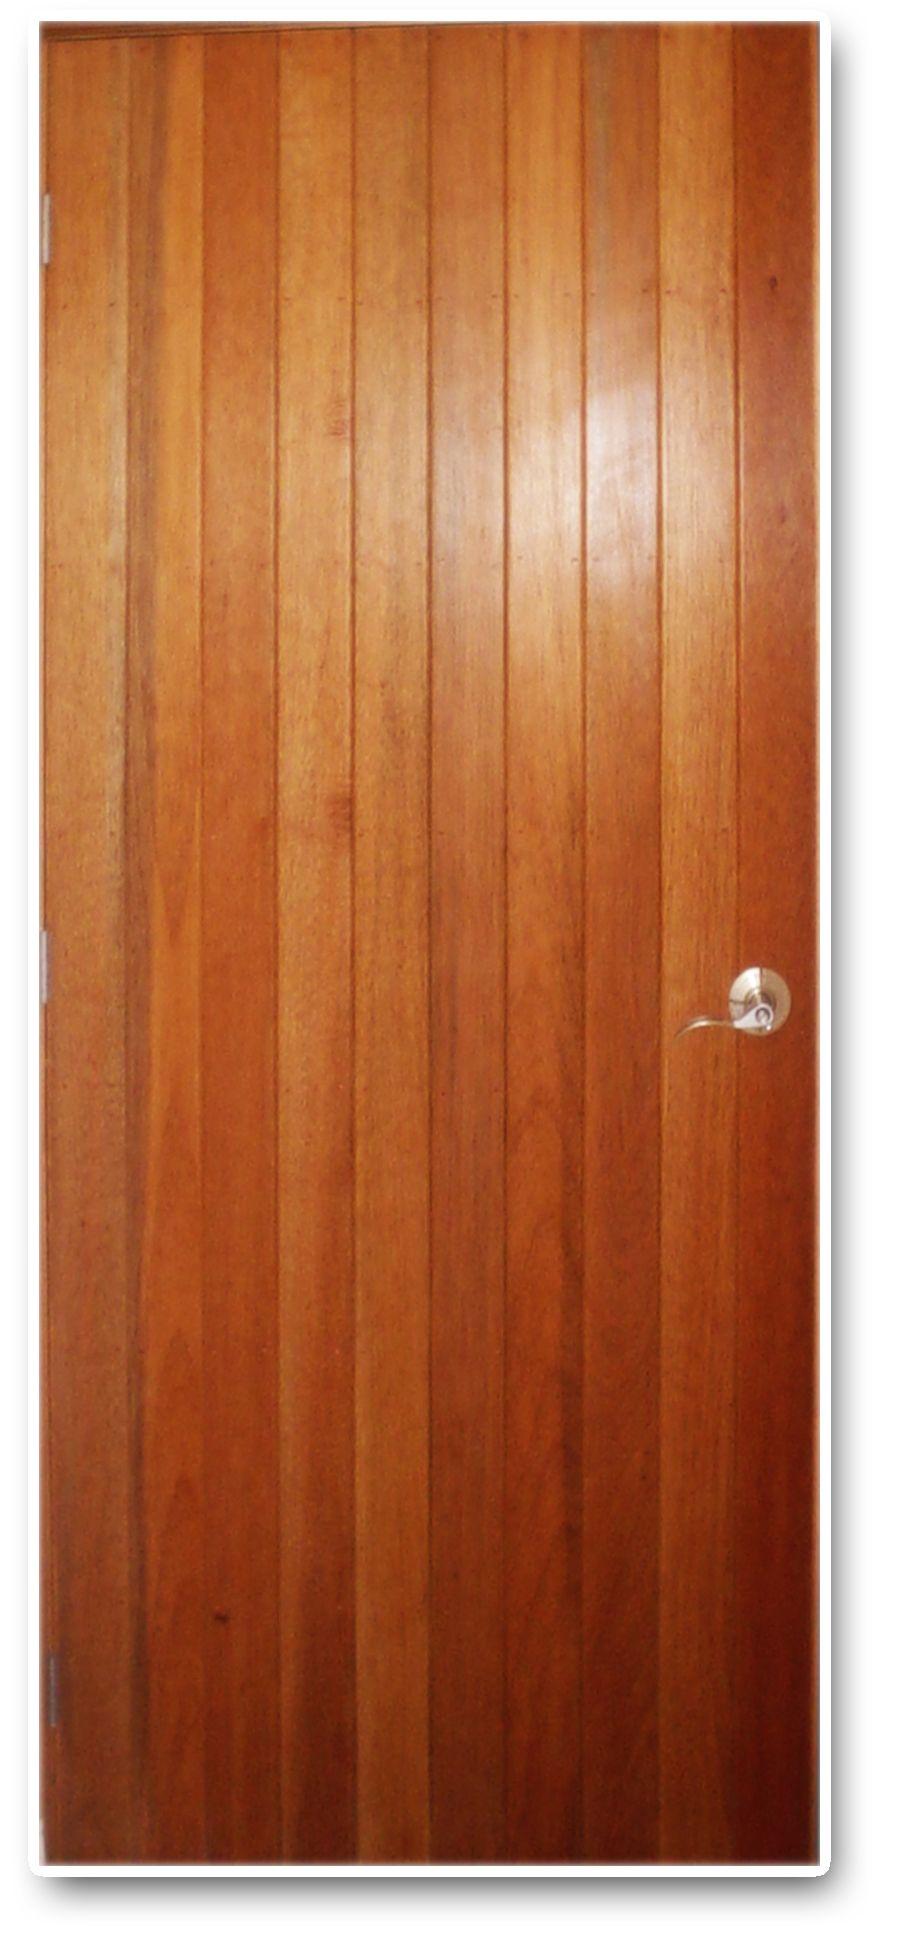 Puerta duelas madera cedro puertas doors puertas - Duelas de madera ...